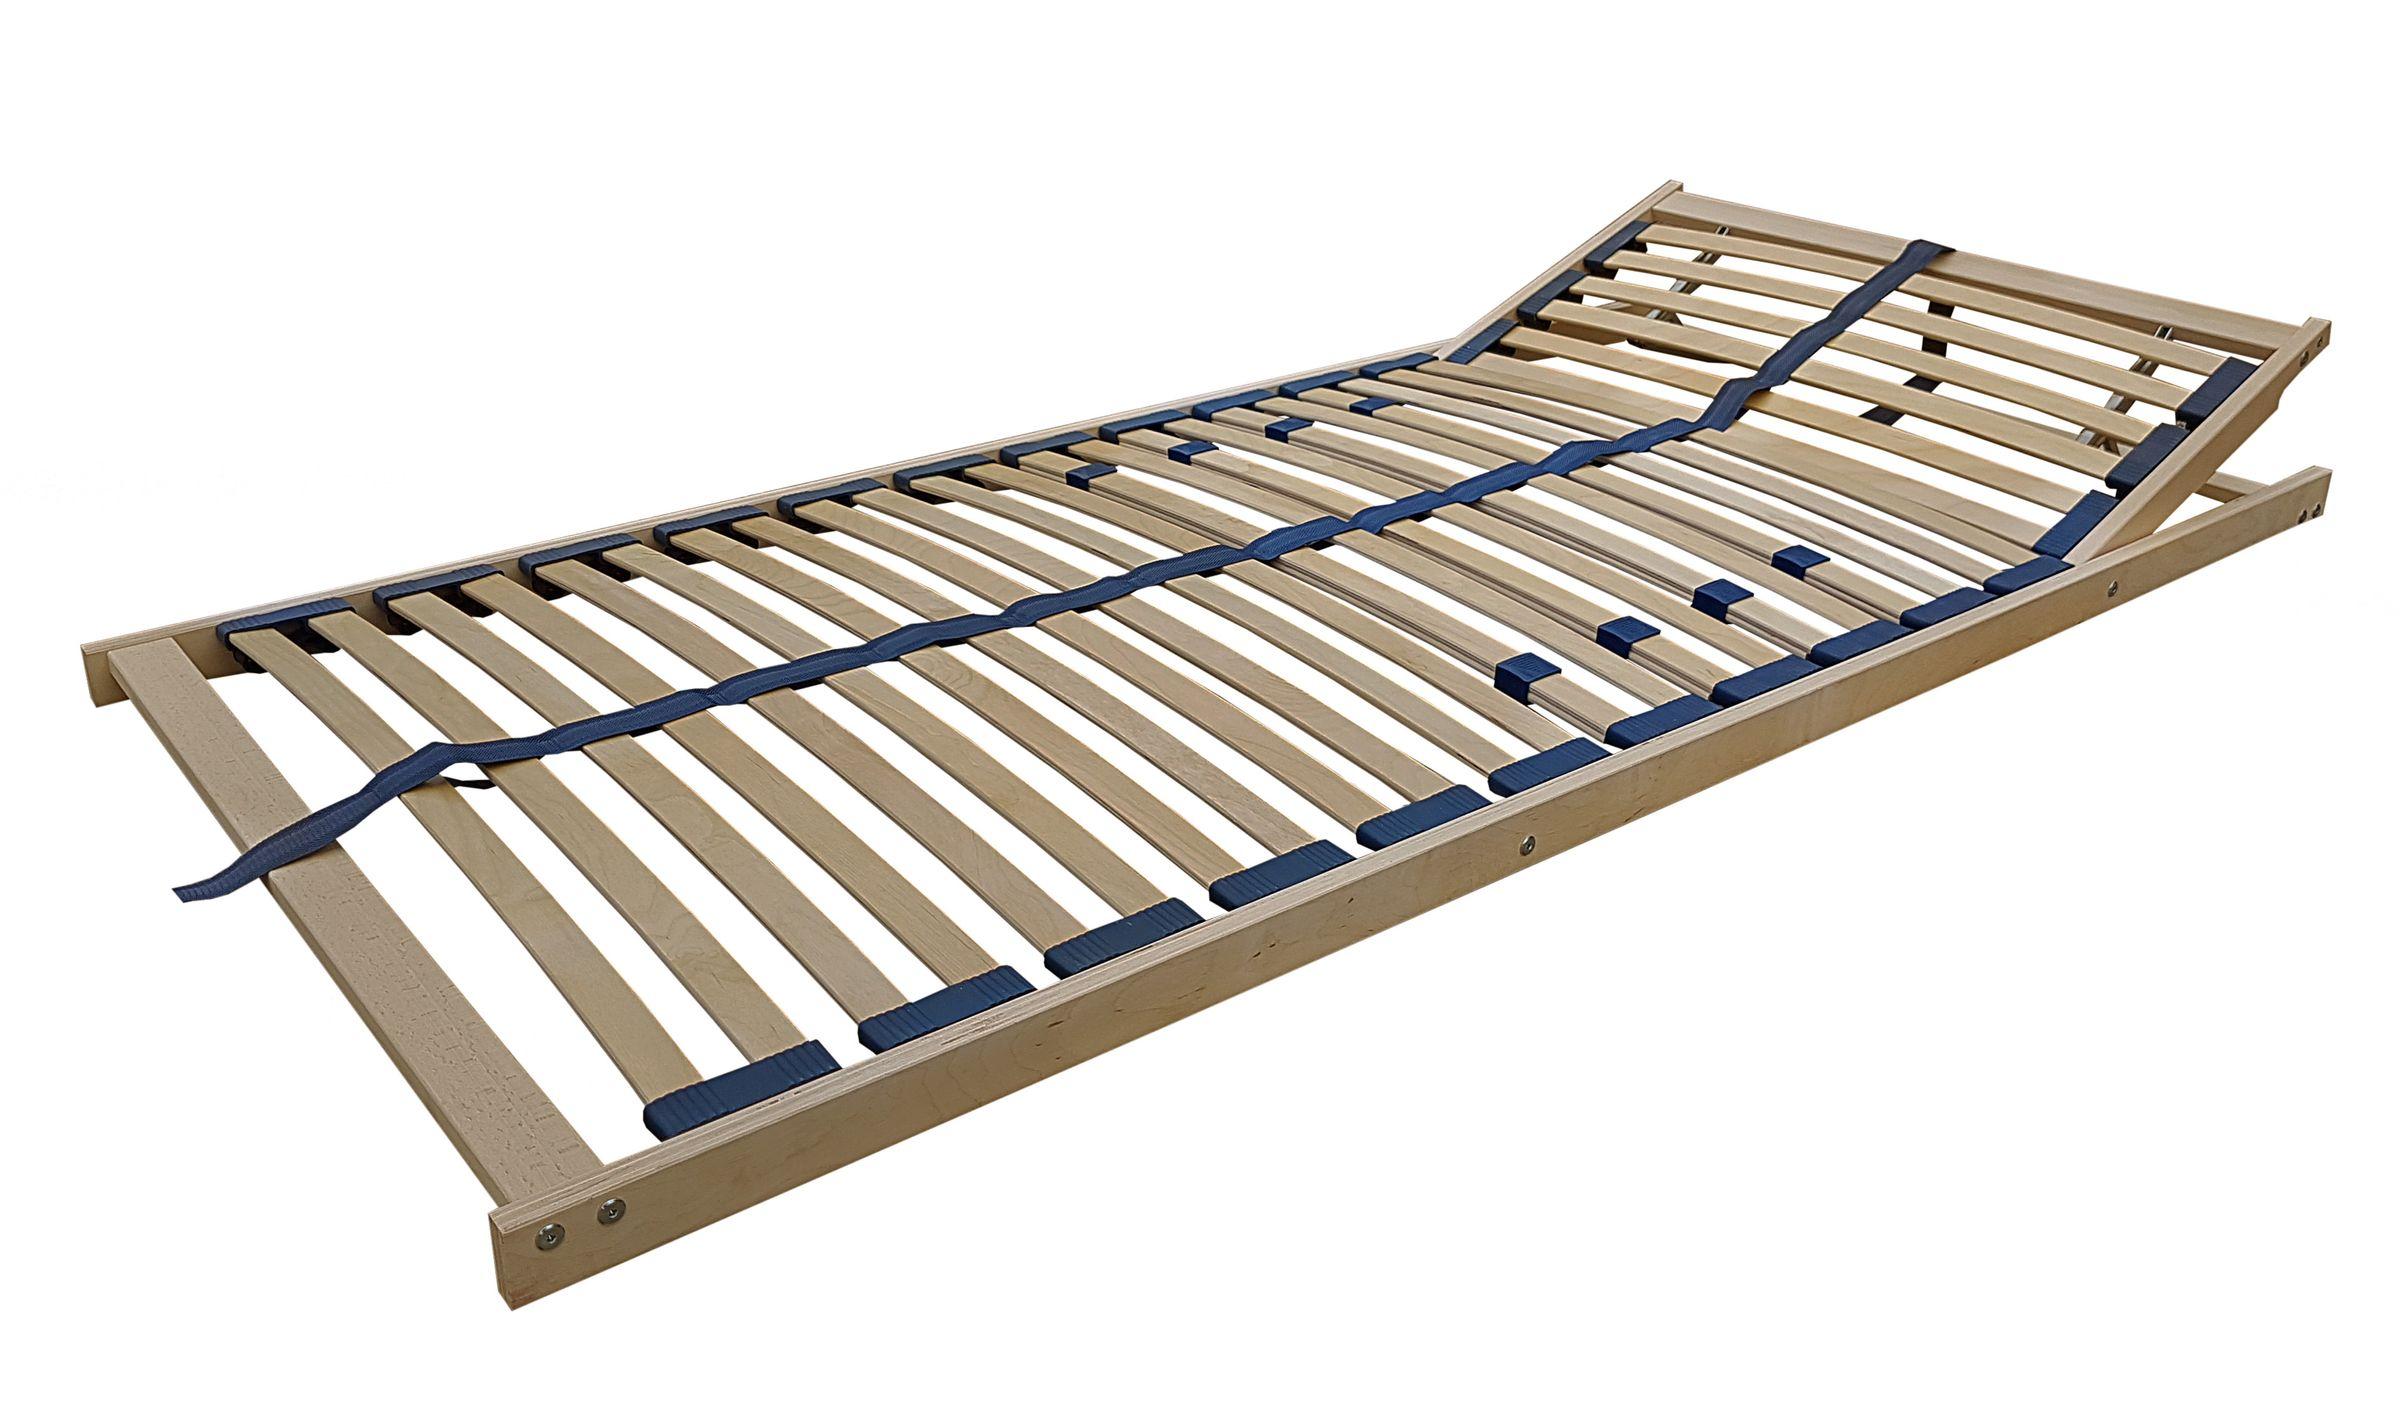 Cama de madera Roble macizo Cama individual 100x200 Estructura de ...